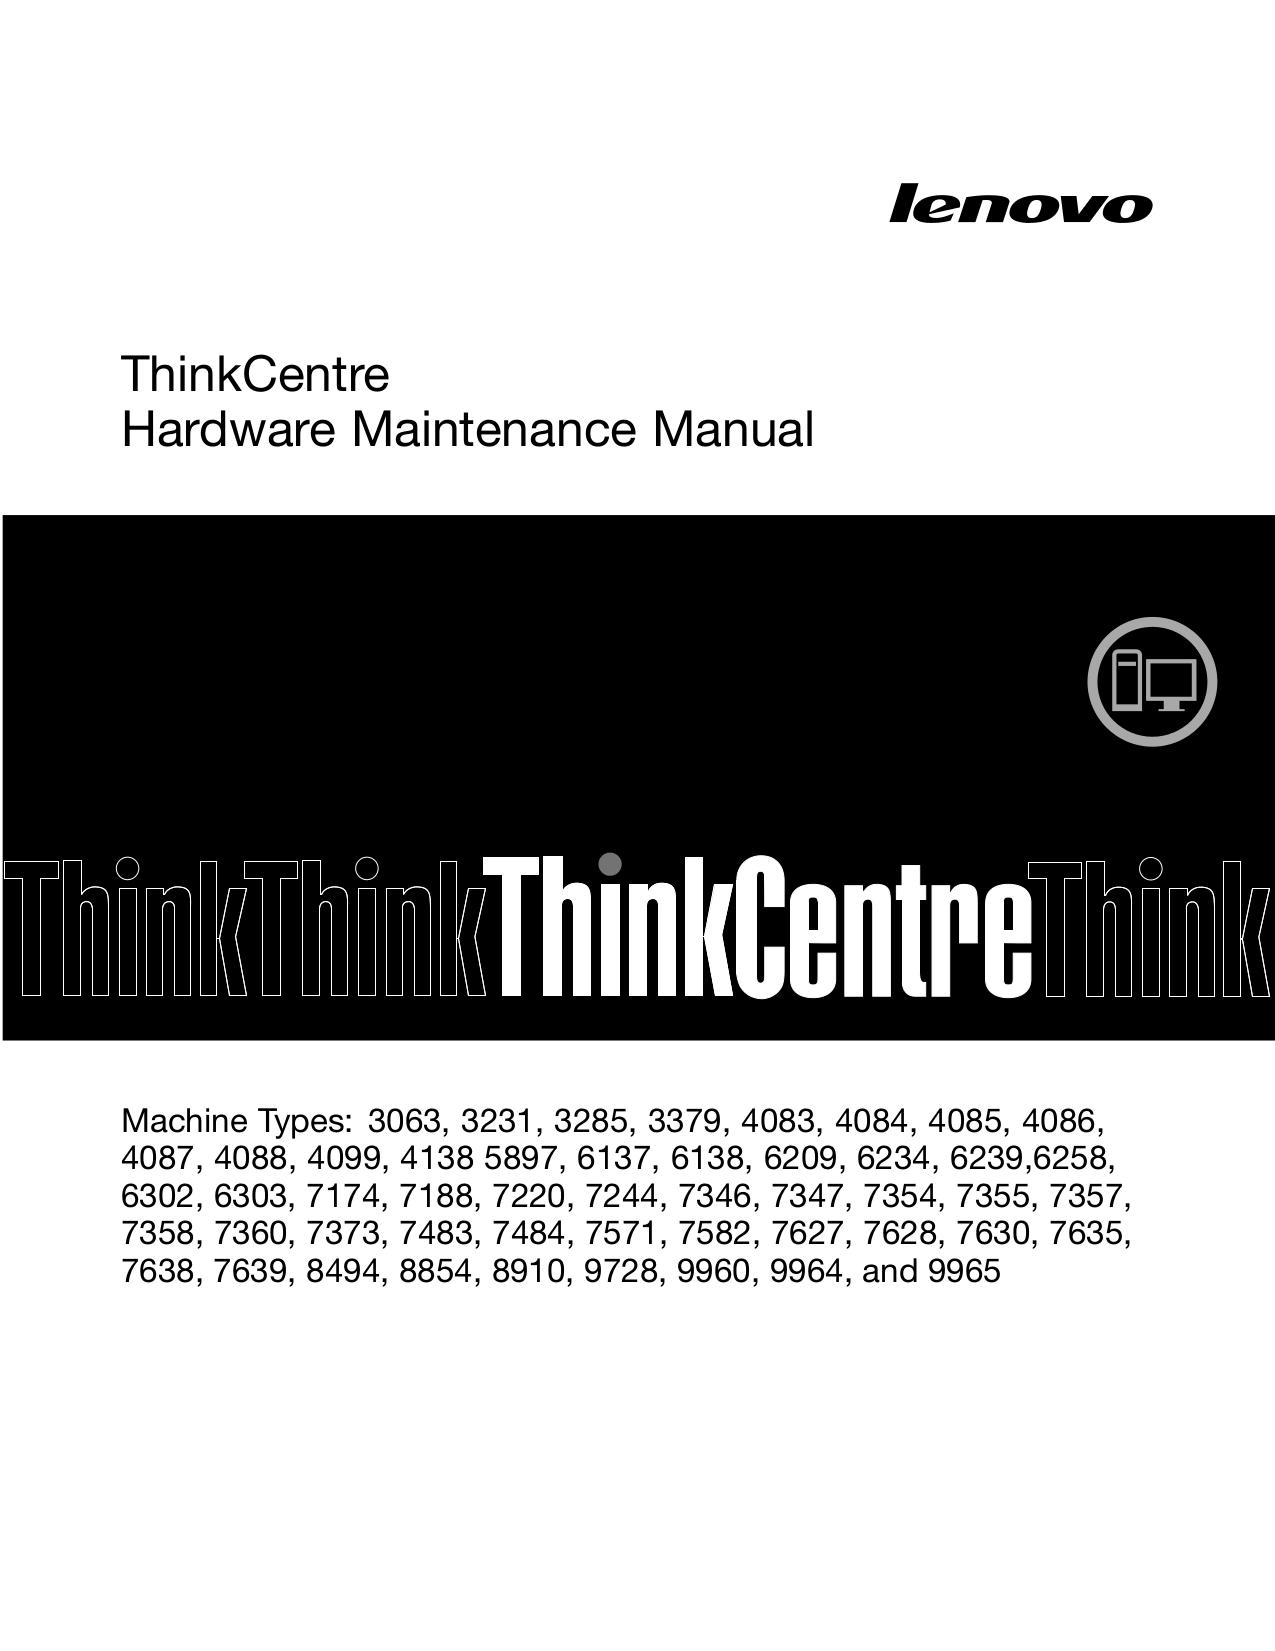 pdf for Lenovo Desktop ThinkCentre M58 9728 manual